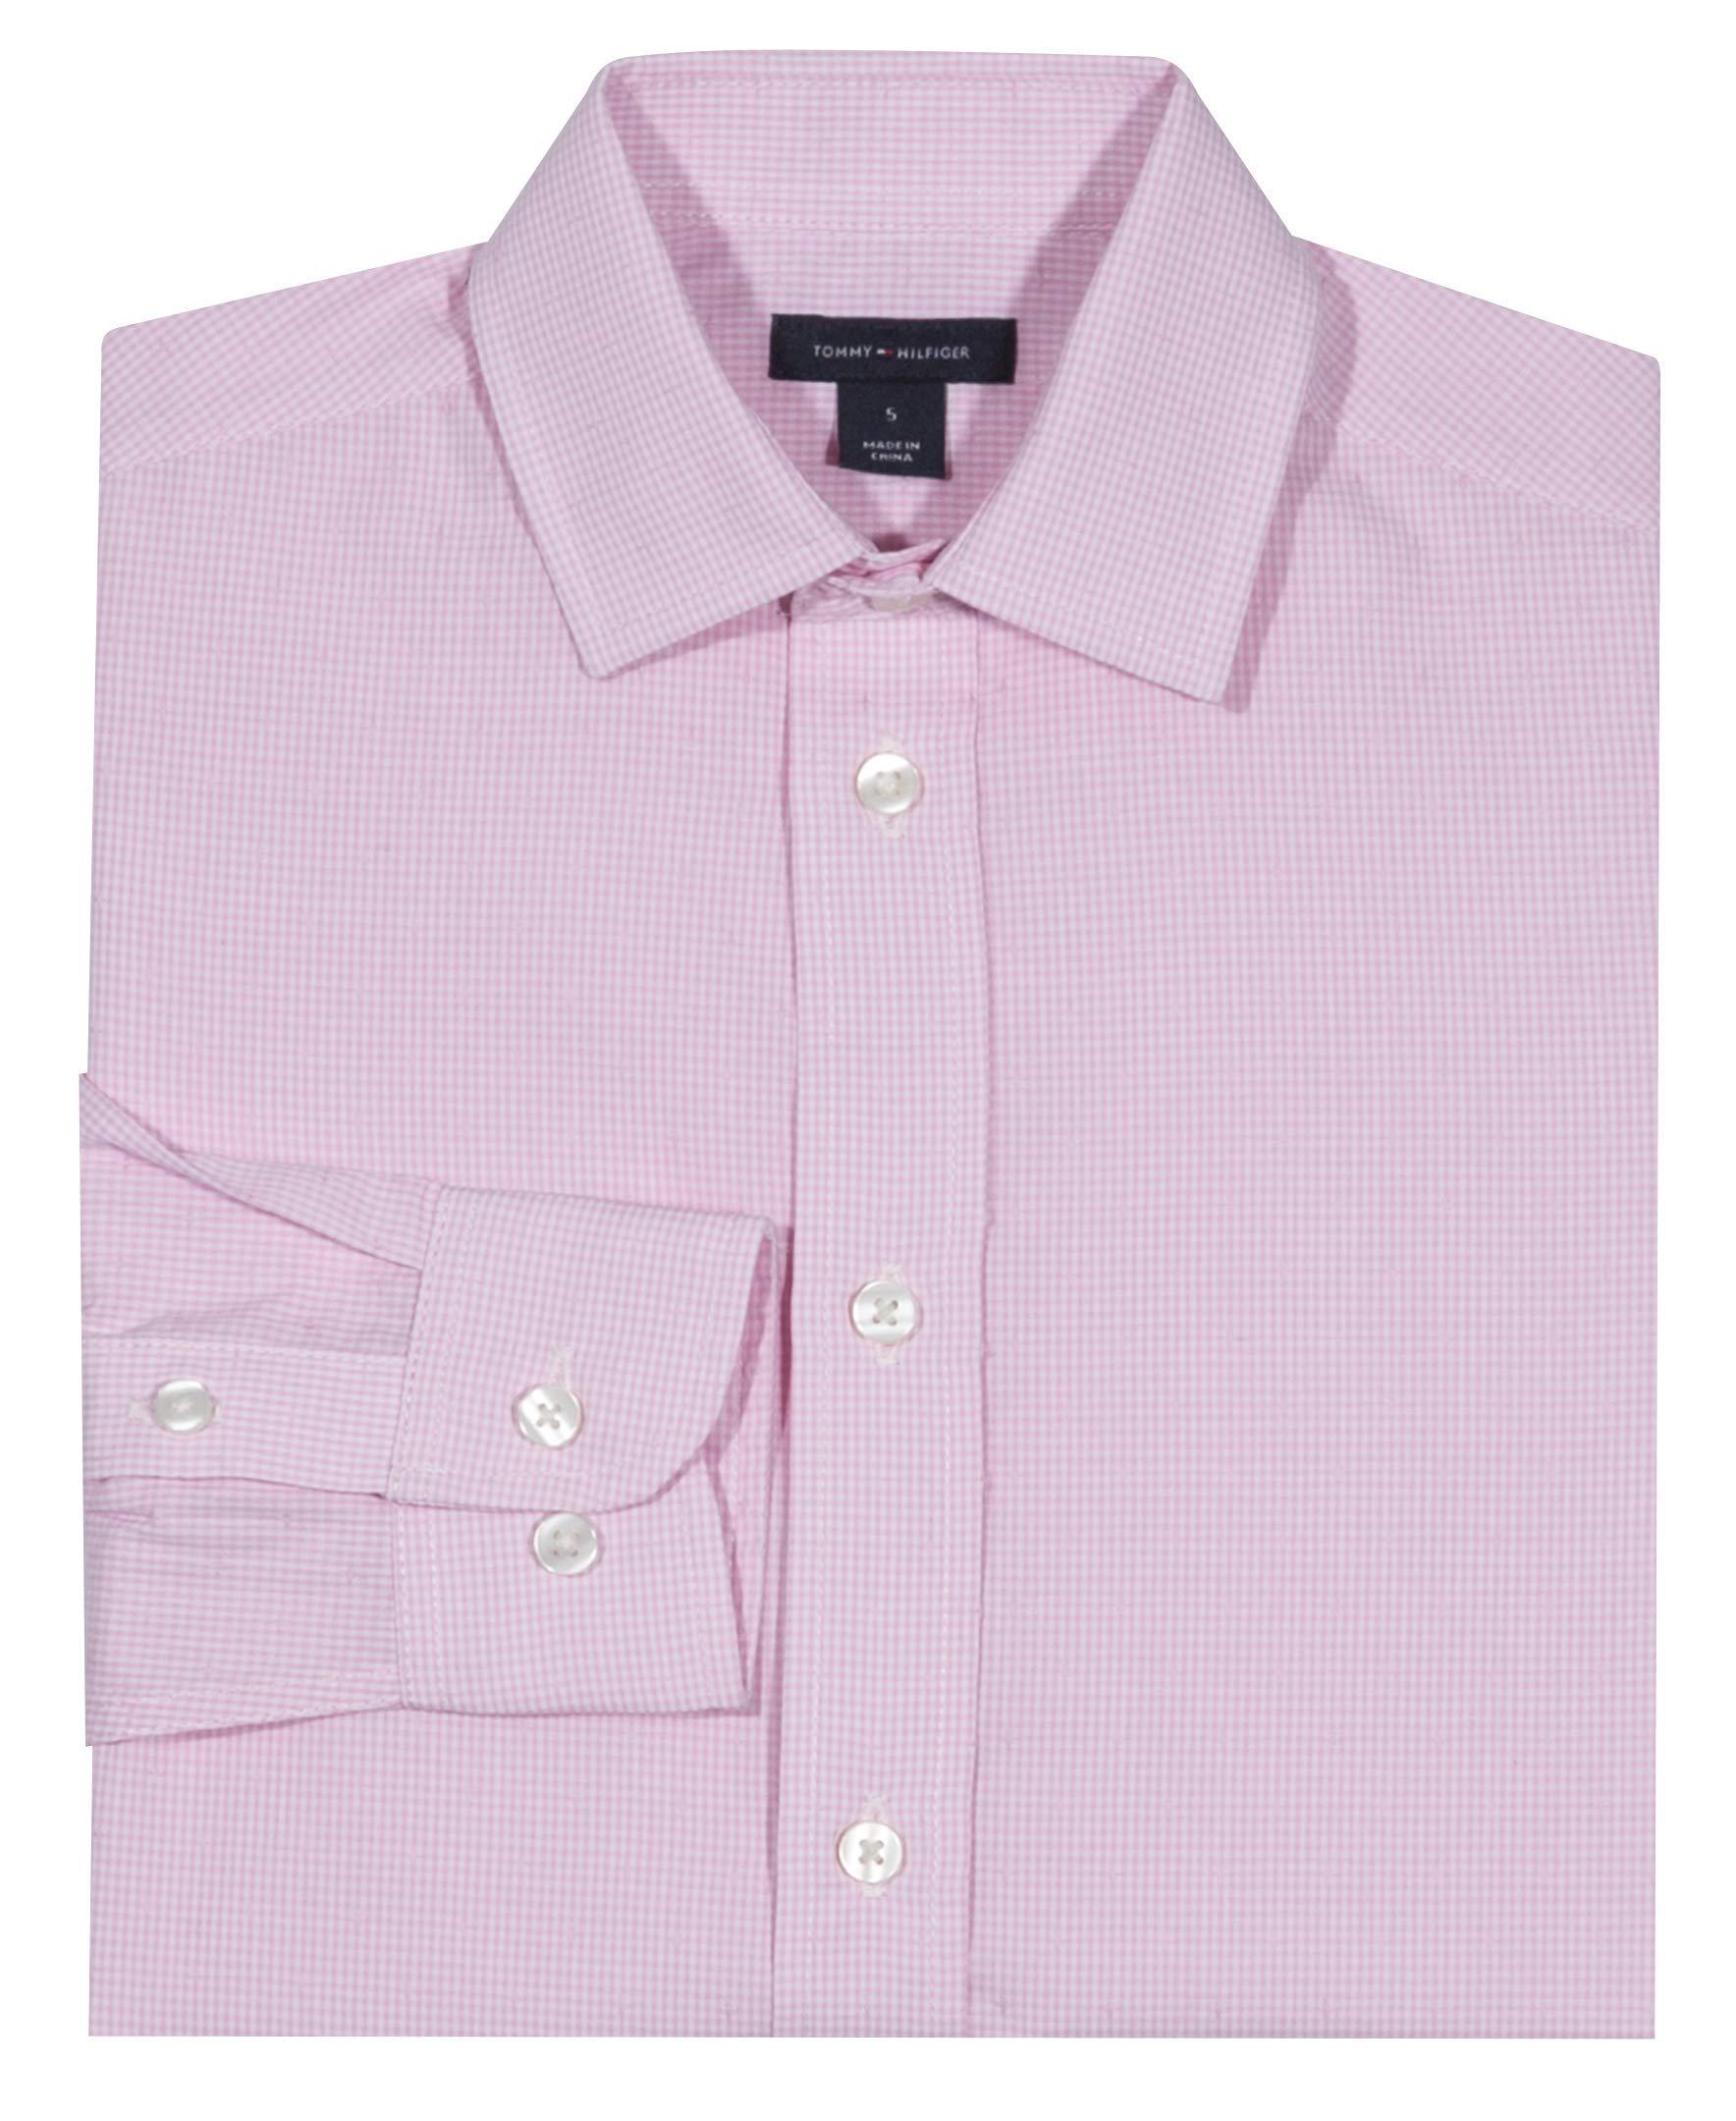 Tommy Hilfiger Boys' Cross Gingham Shirt, Light Pink, 16 by Tommy Hilfiger (Image #3)